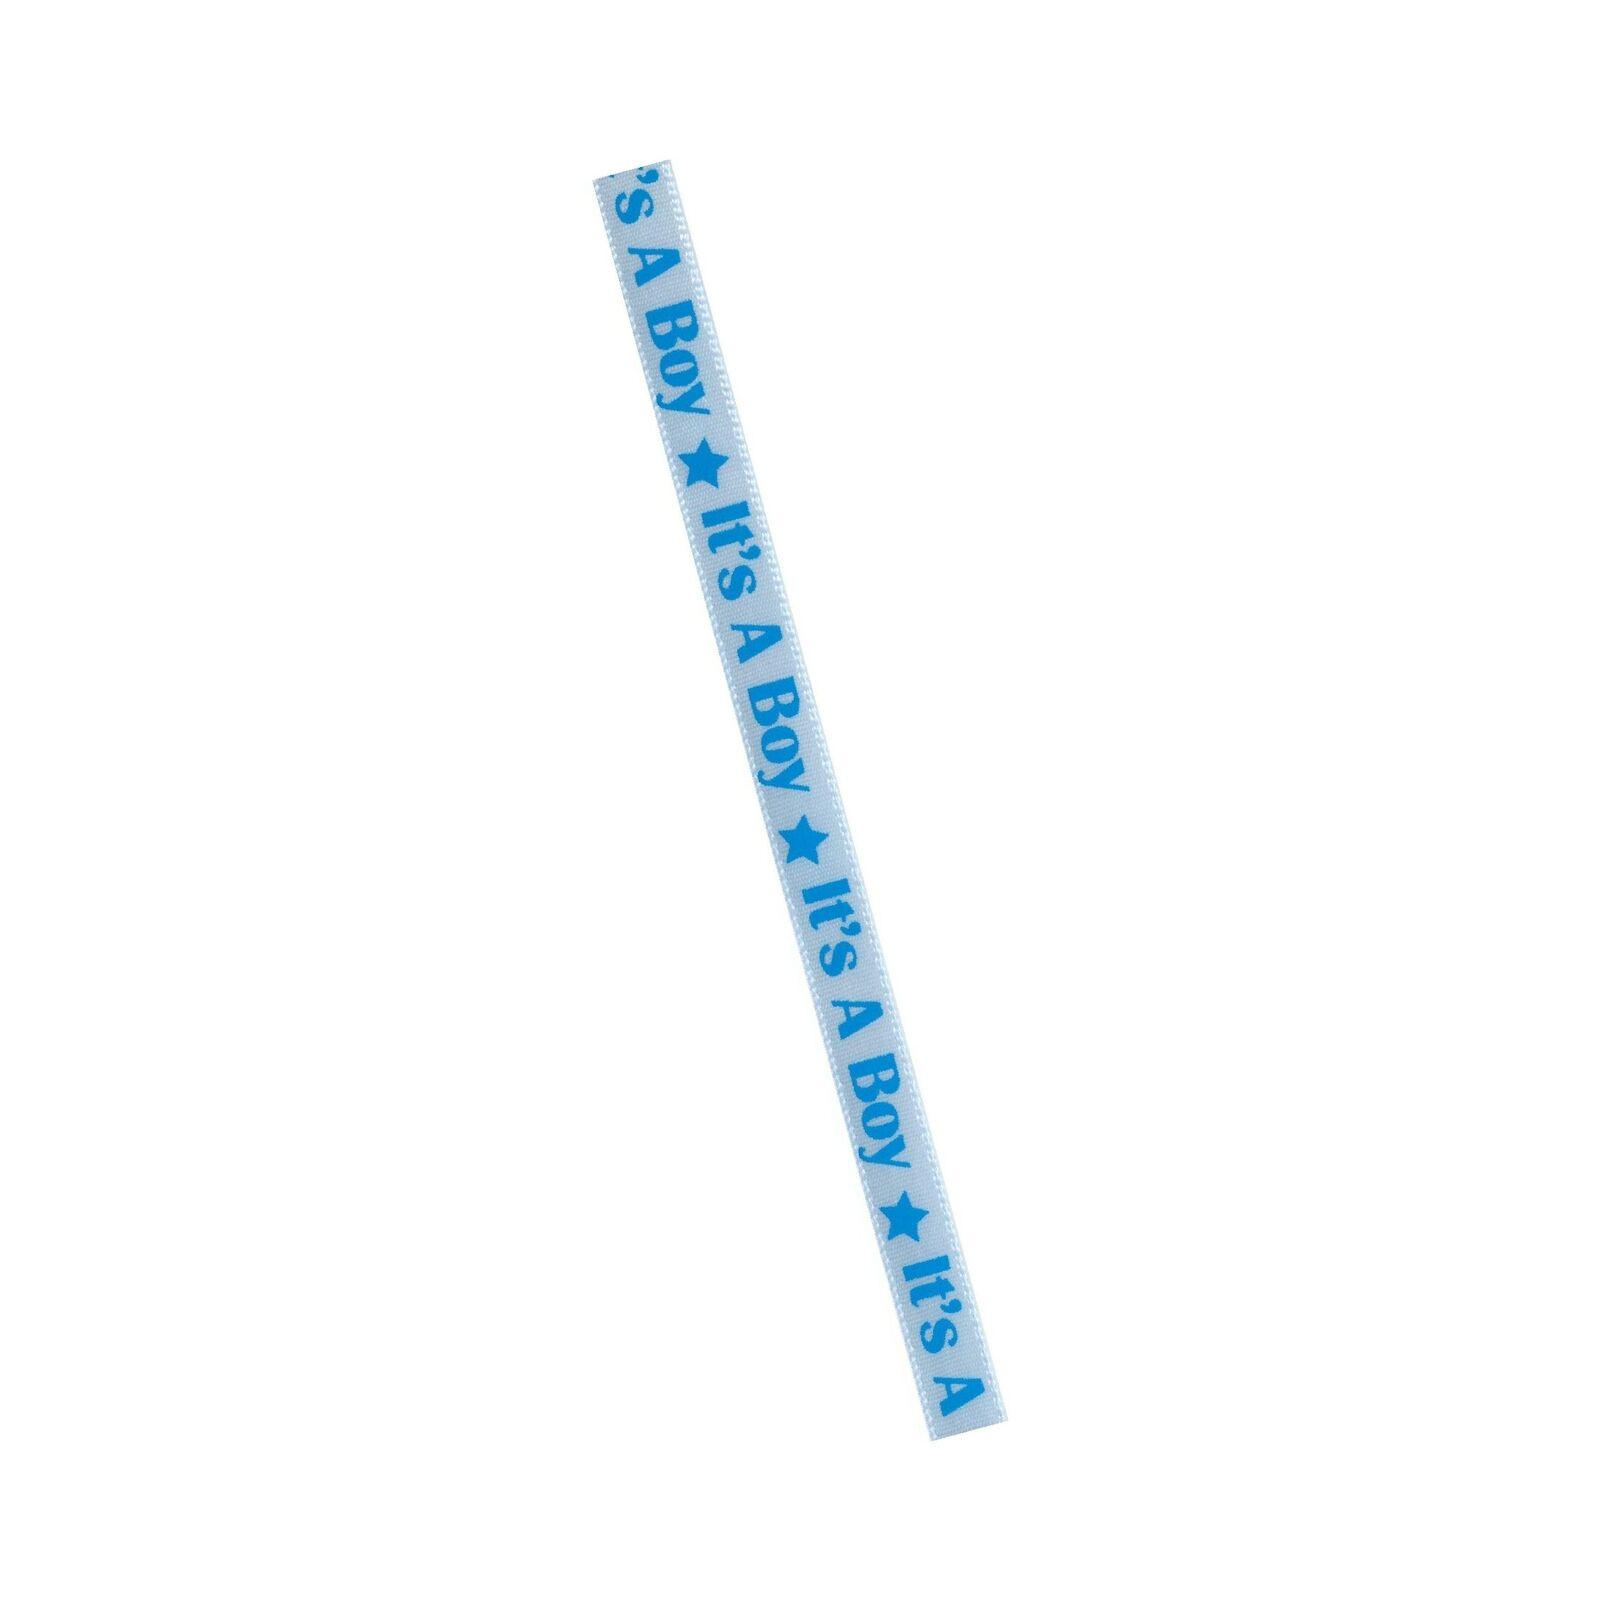 Offray Baby Celebration Craft Ribbon 3//8-Inch x 12-Feet Blue